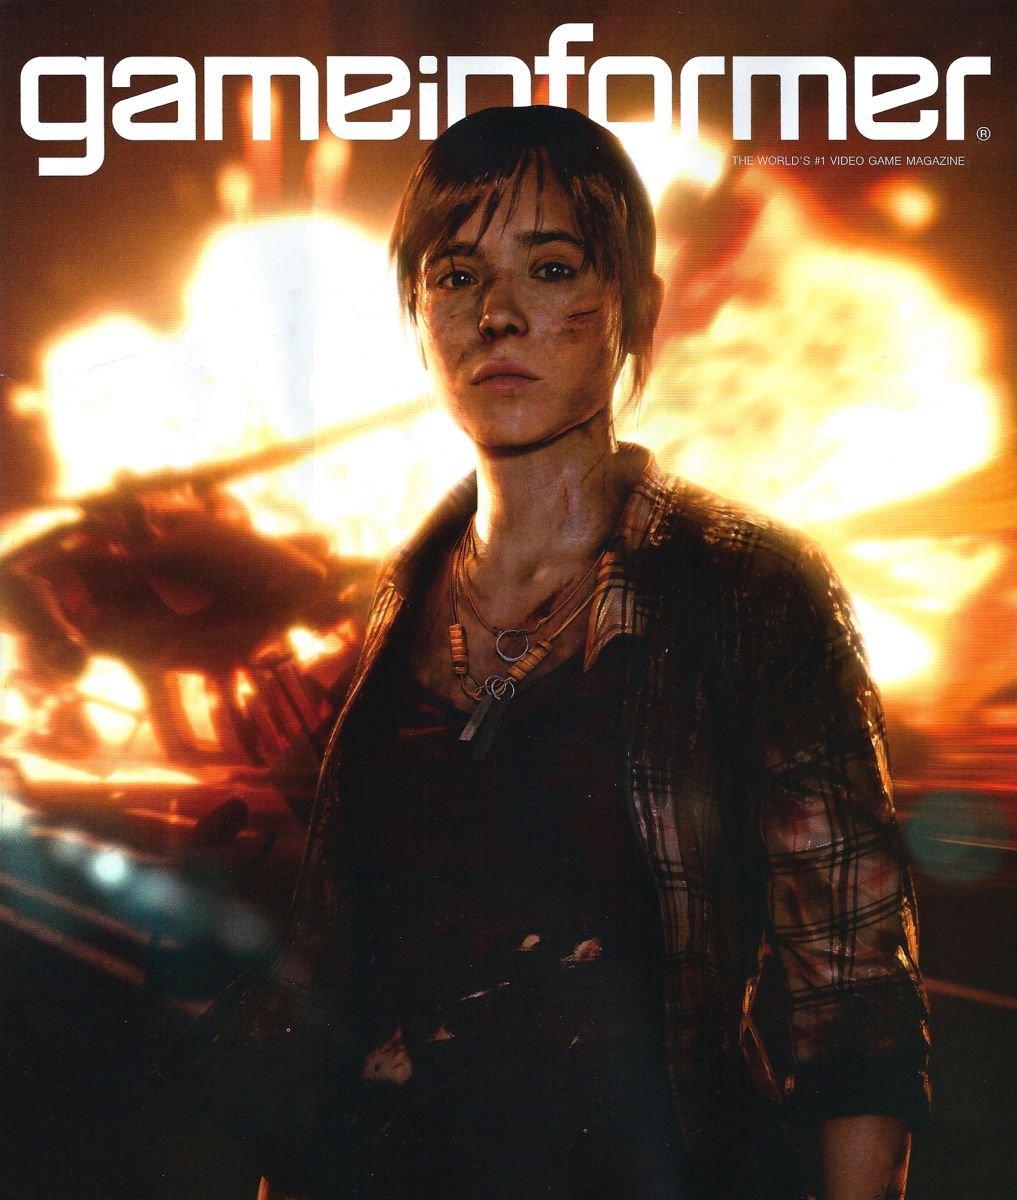 Game Informer Issue 235 November 2012 Cover 5 Of 5